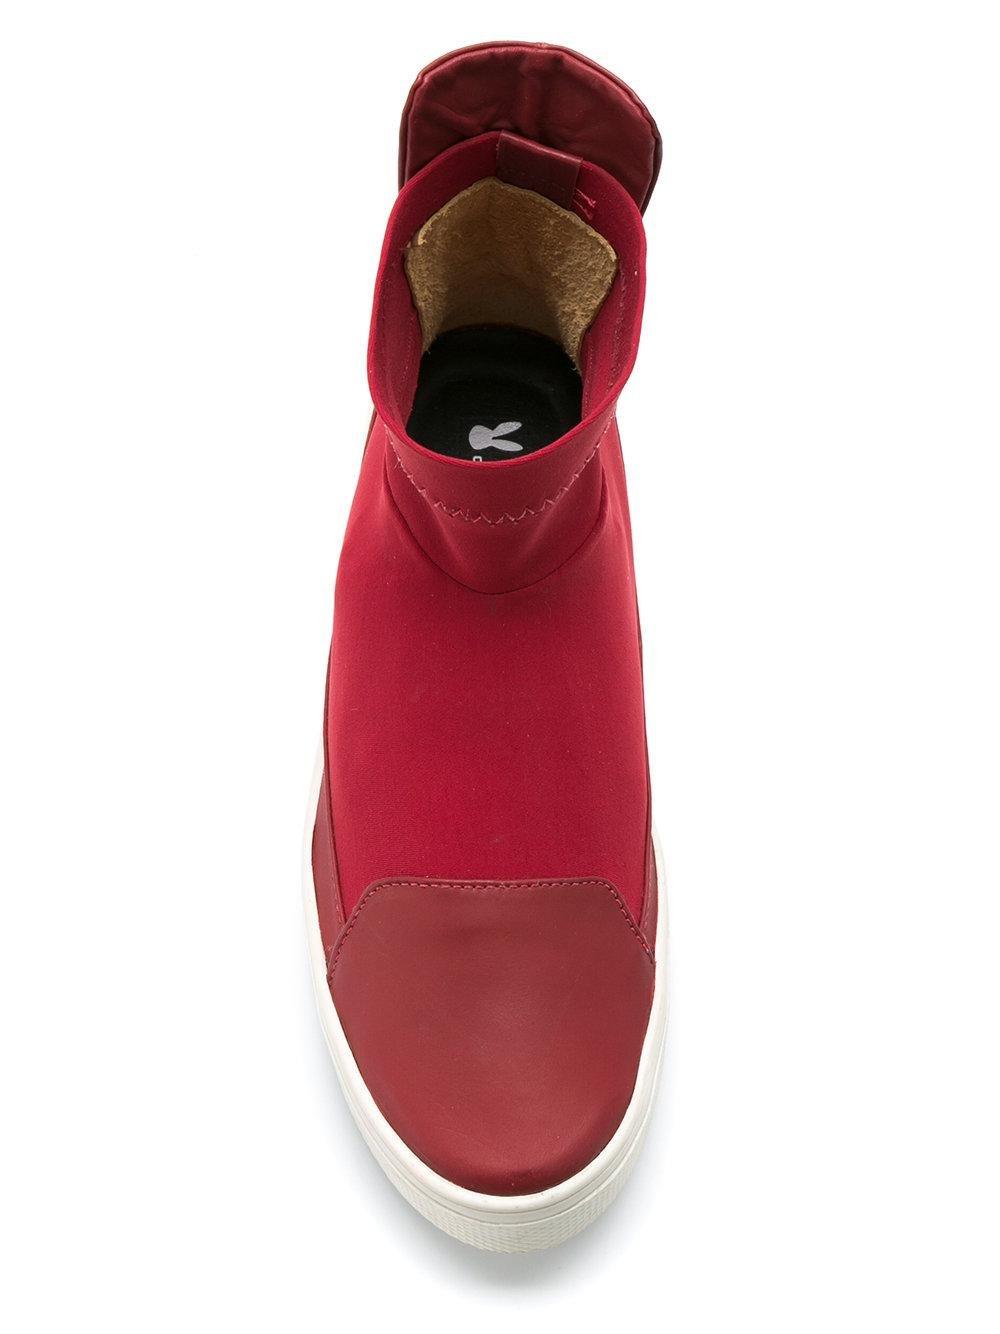 Gloria Coelho Leather Mid-top Sneakers in Red